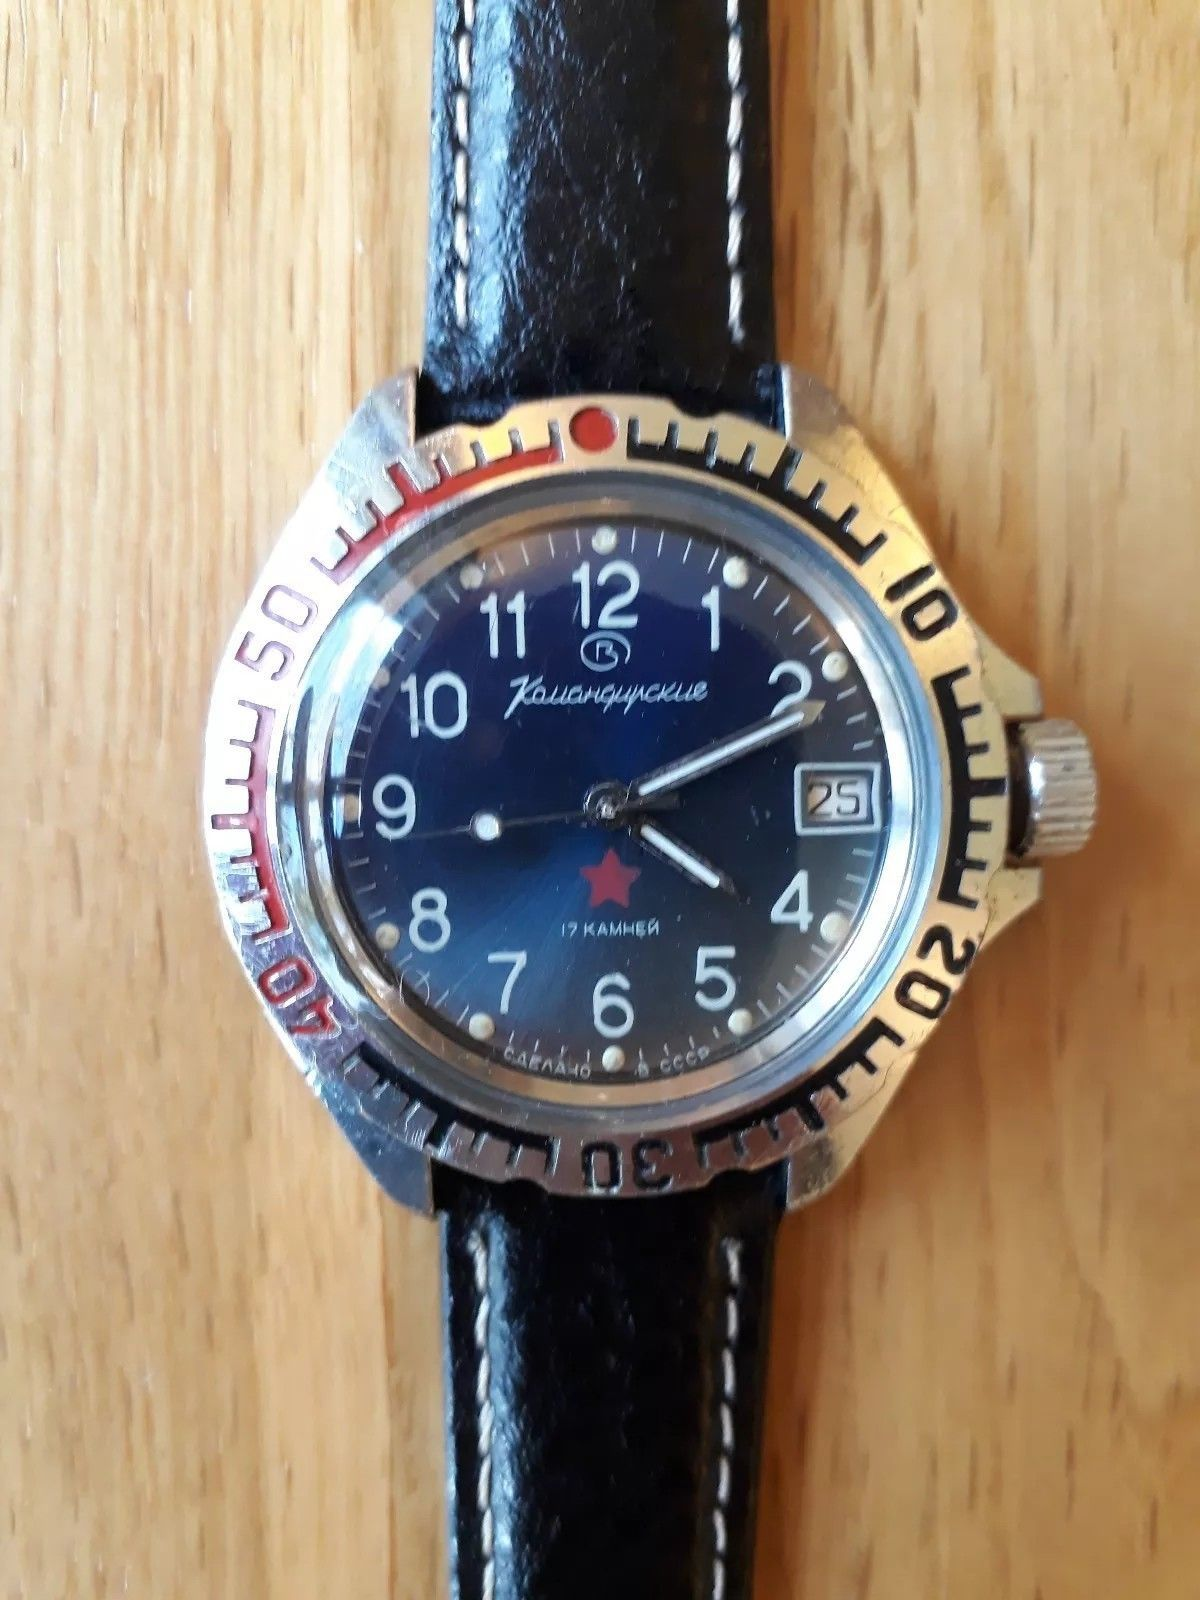 8e5f189bb2419 Vostok Komandirskie Soviet USSR Vintage 1980s Diver Watch Raketa 17J 2414A  SU | eBay